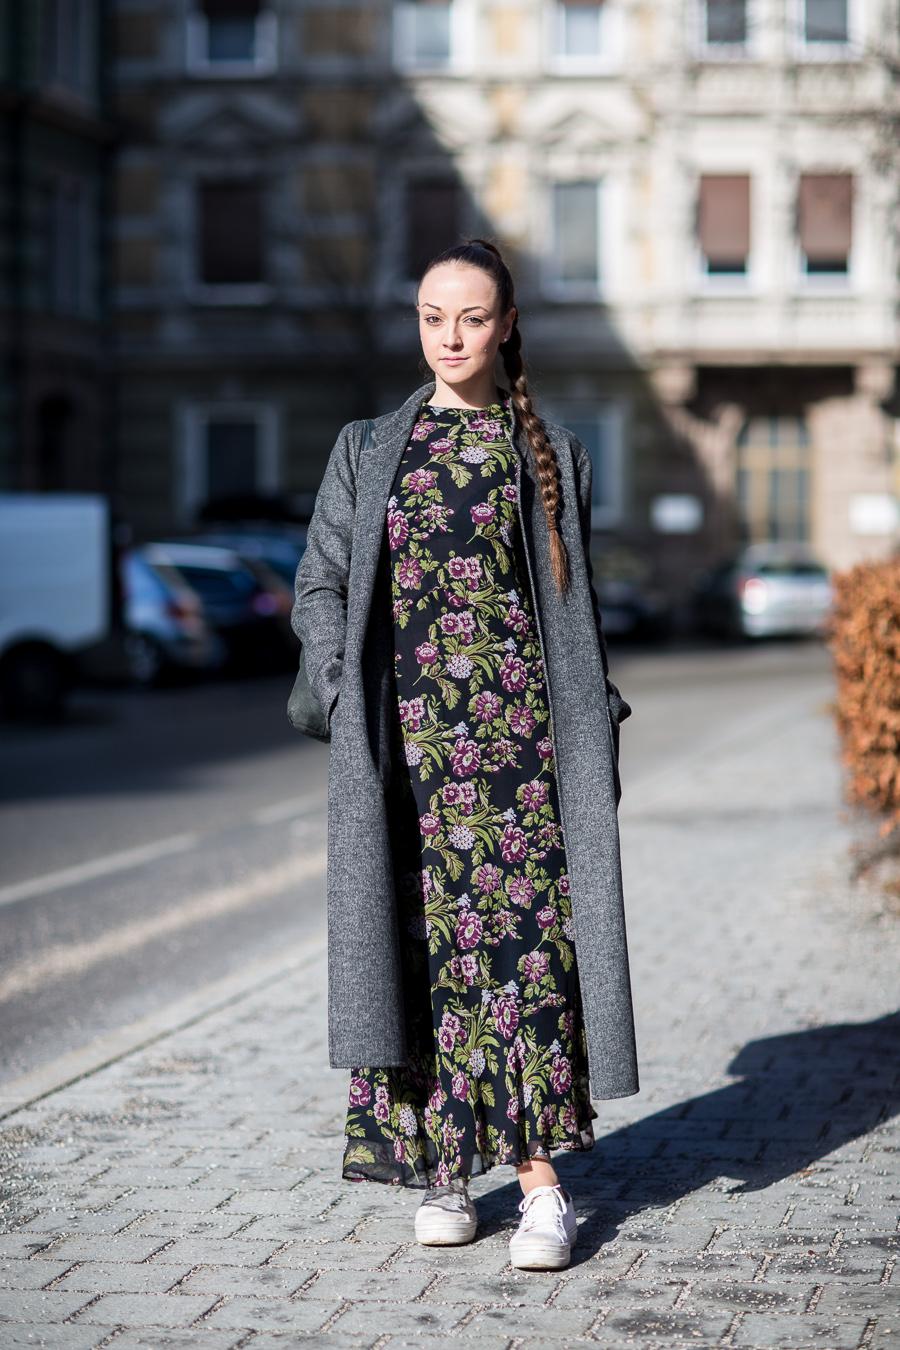 street-style-fashion-blog-innsbruck-antoaneta